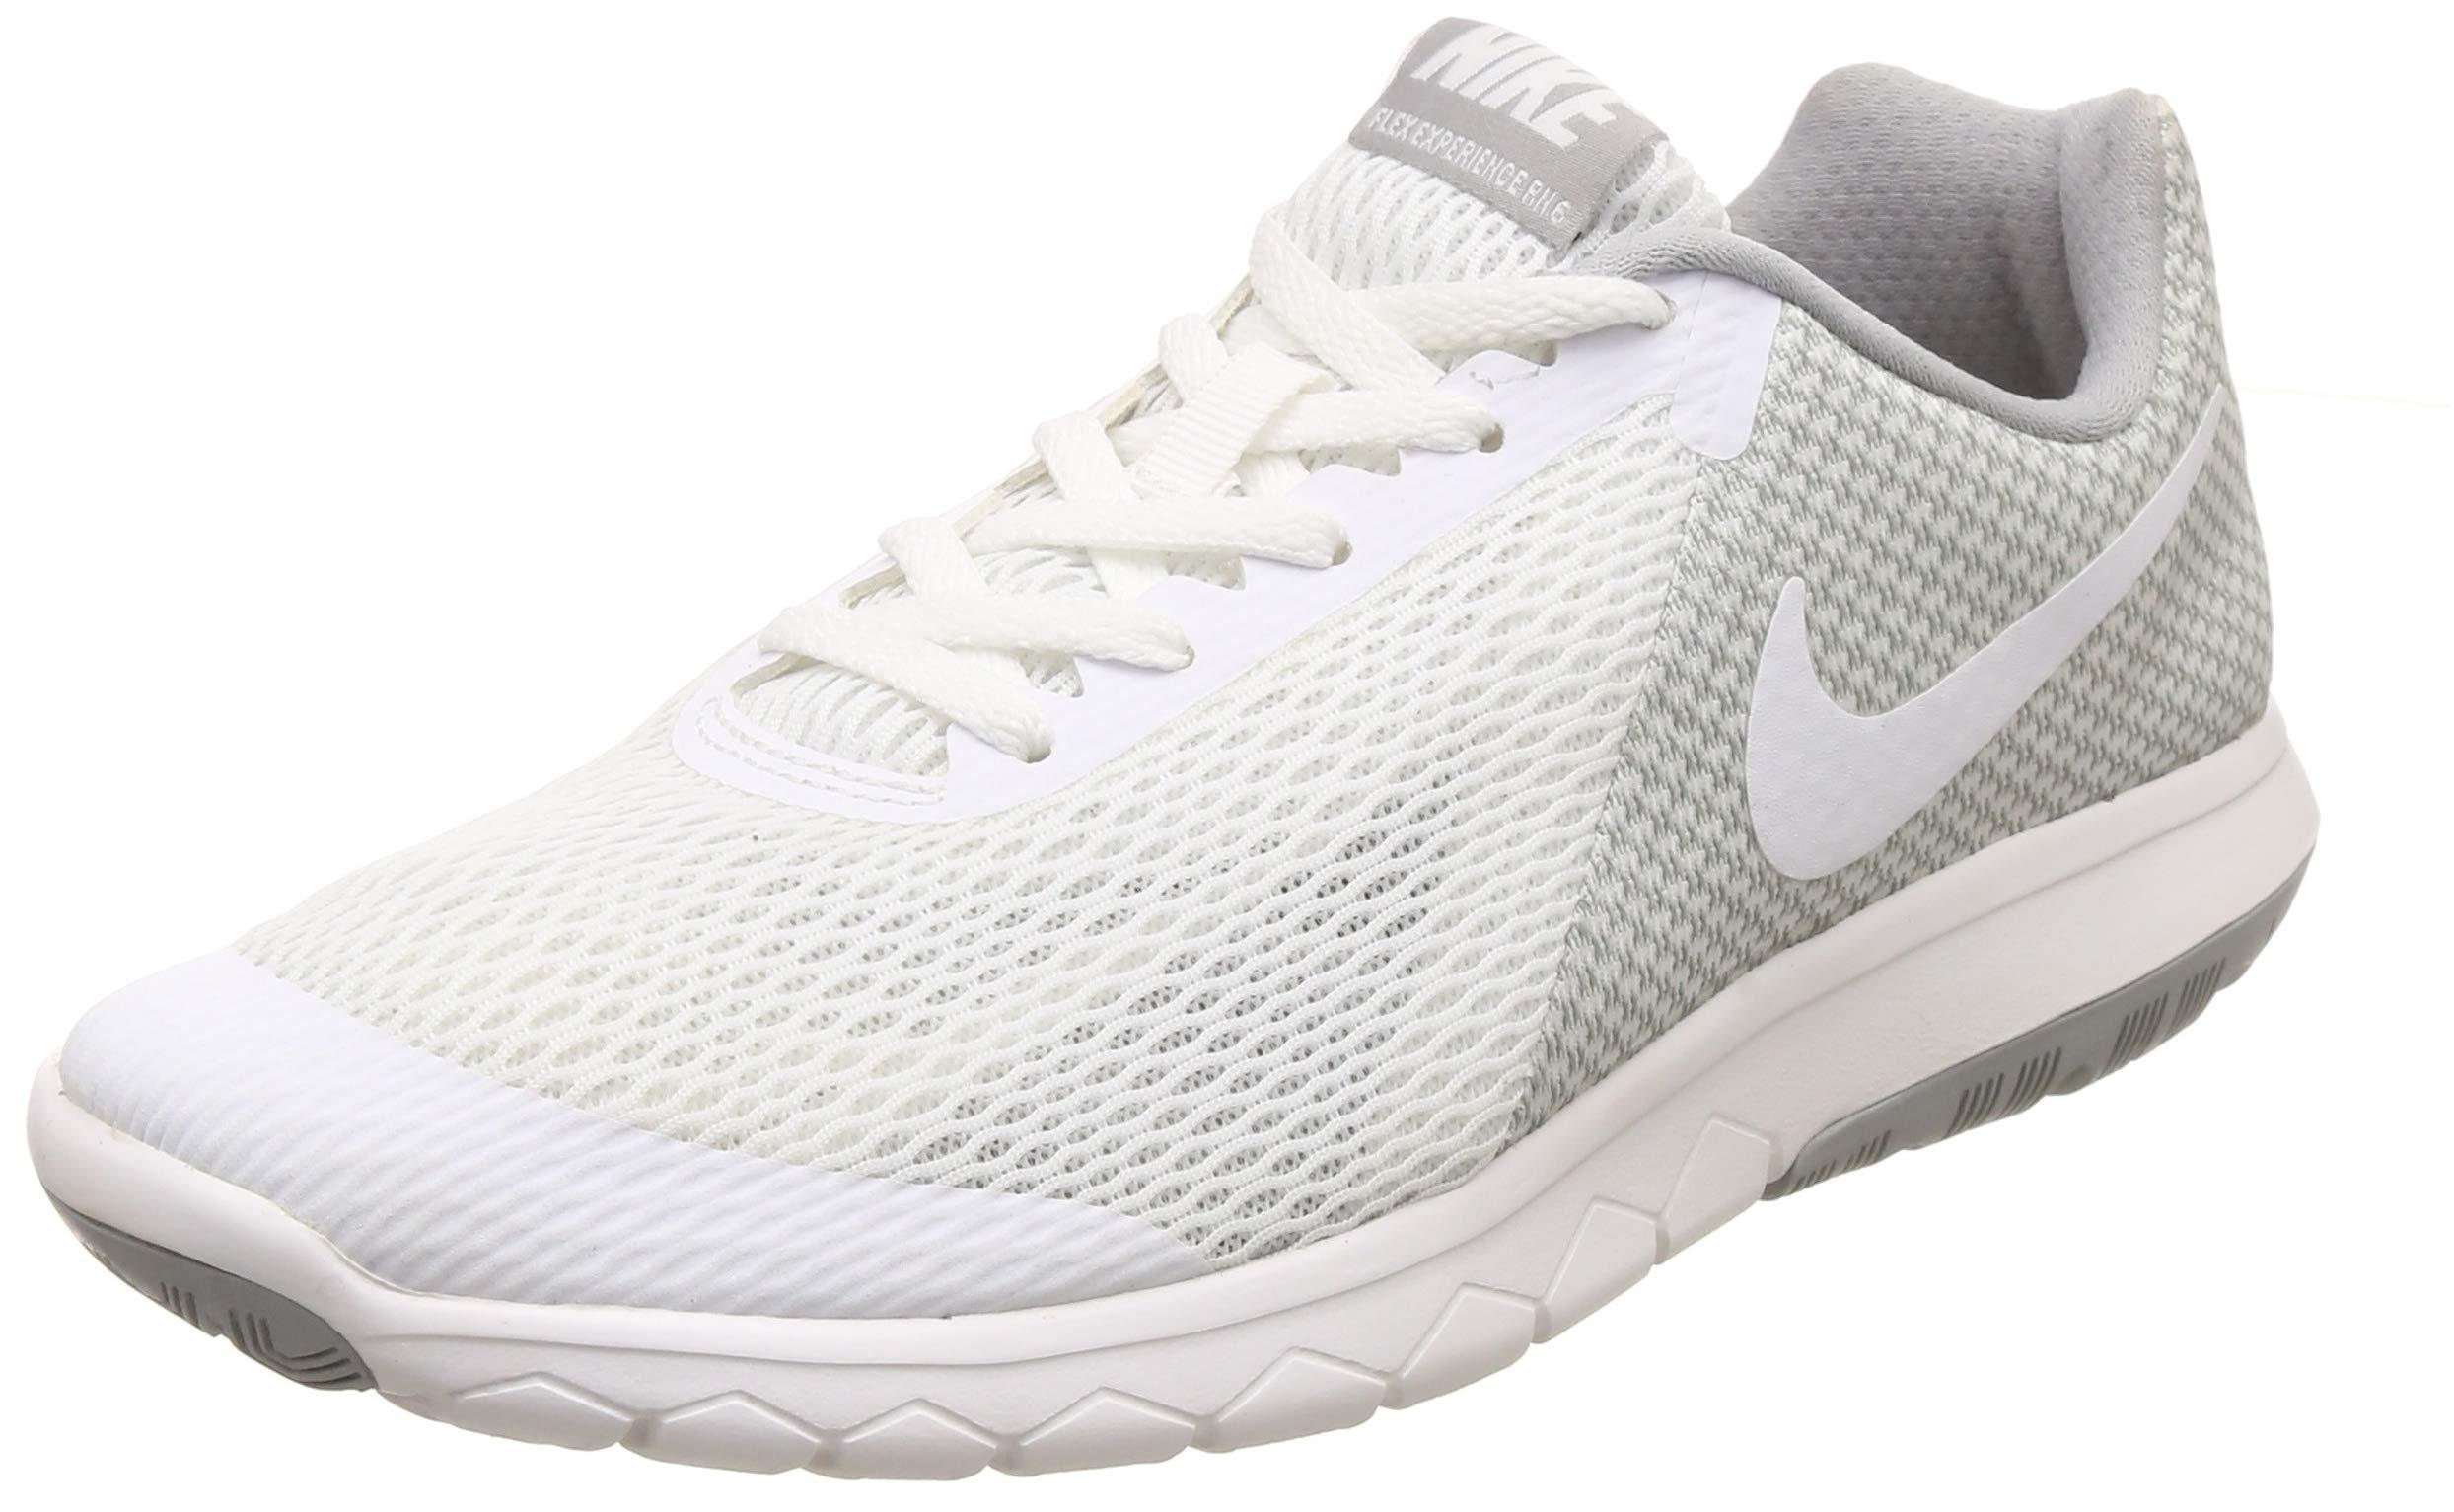 nike flex experience 6 women's running shoes